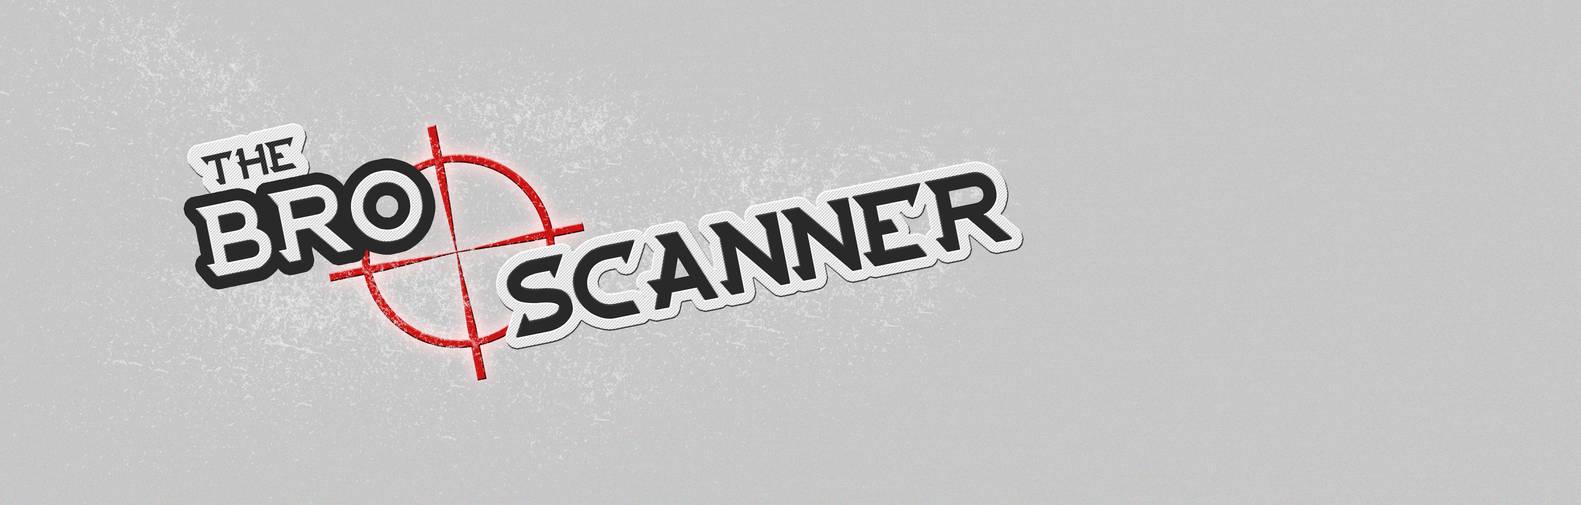 The Bro Scanner logo